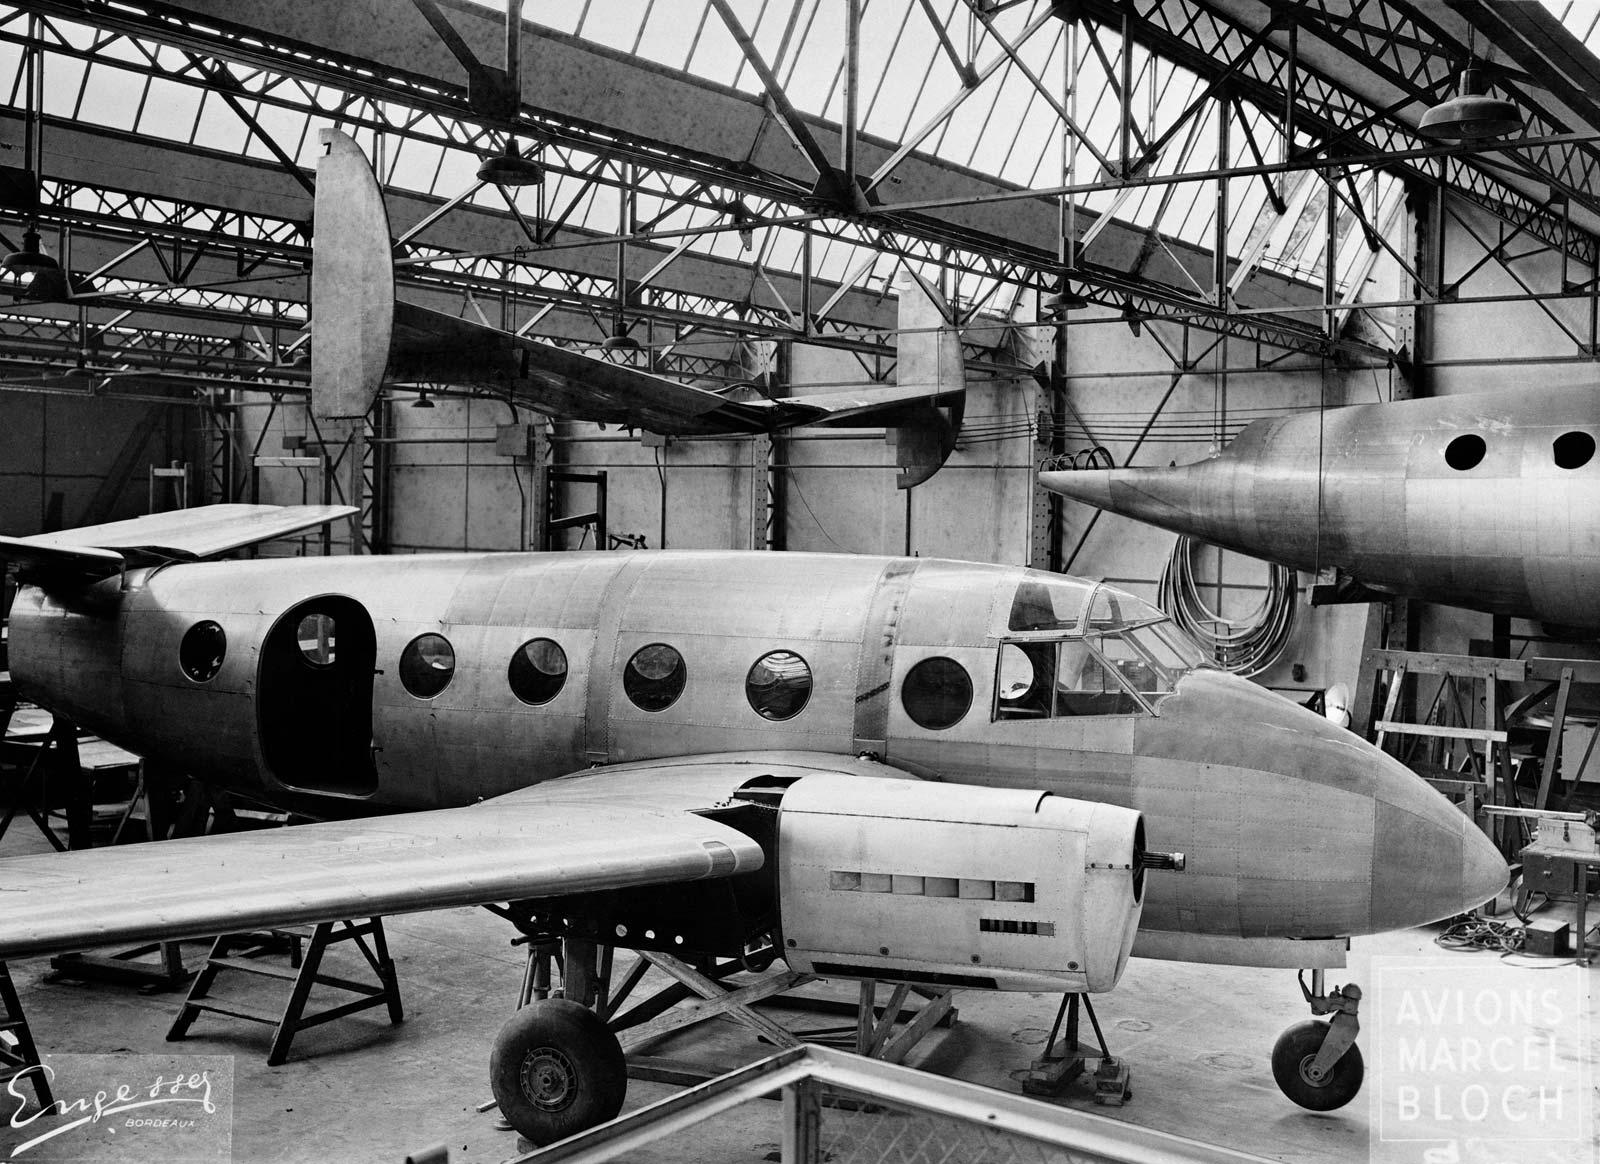 History of Dassault Aviation, 1945 to 1965